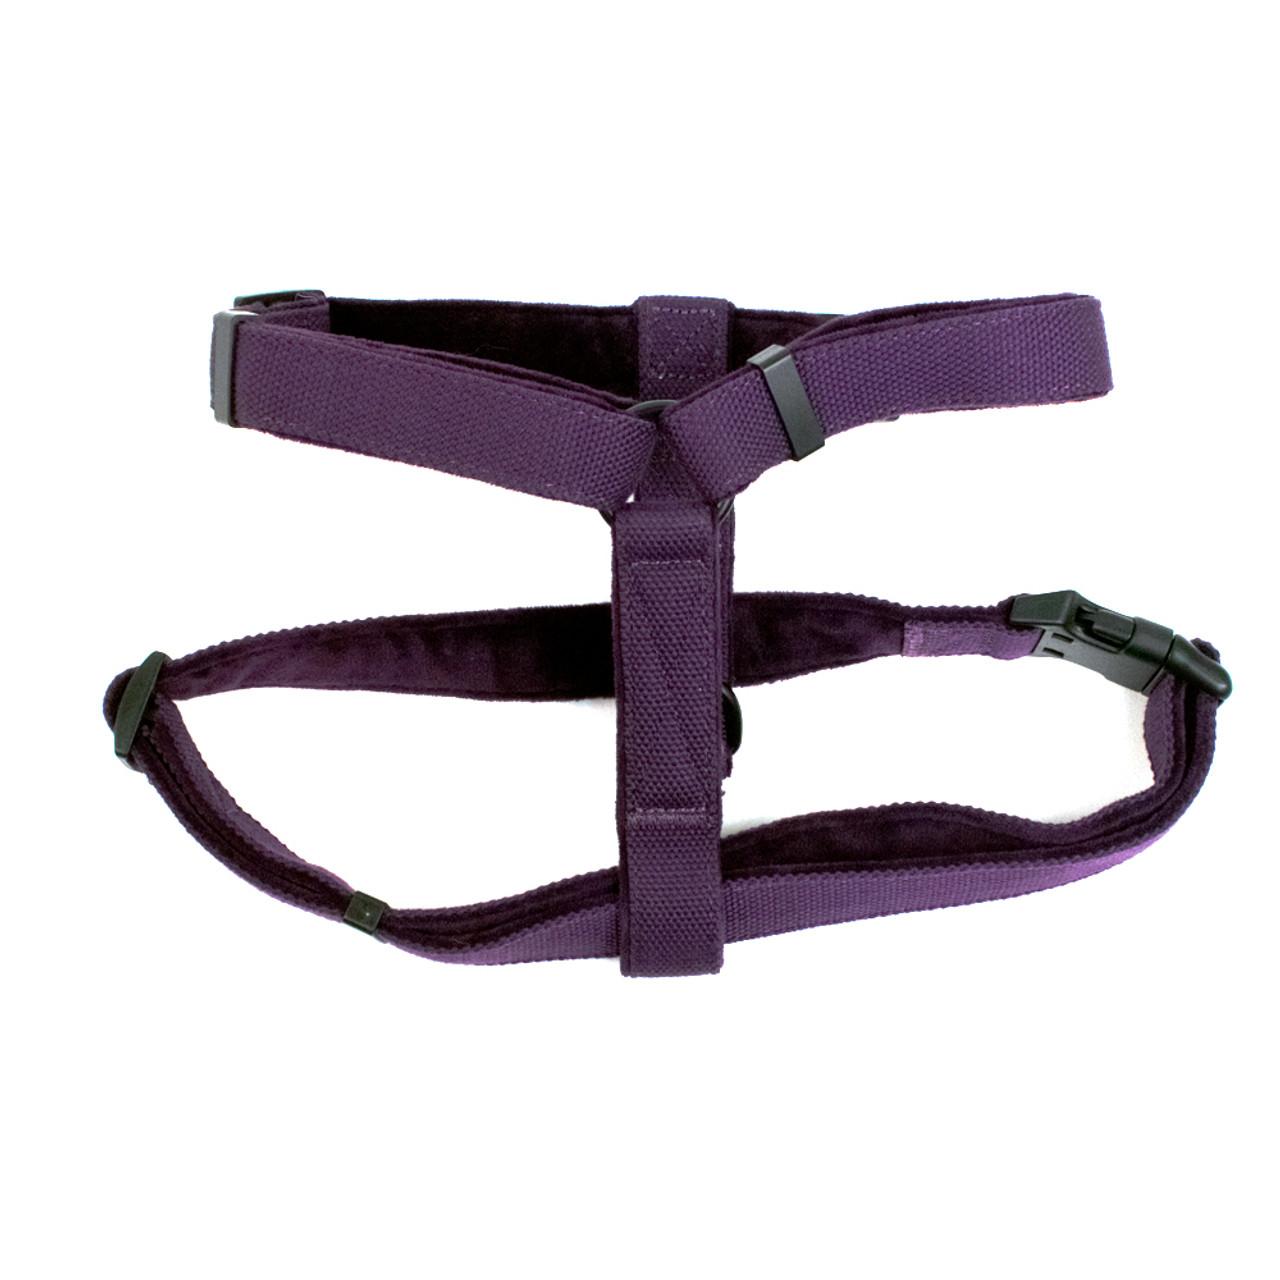 Fetch Your Own Adventure Eco-Friendly Woven Purple Dg Harness